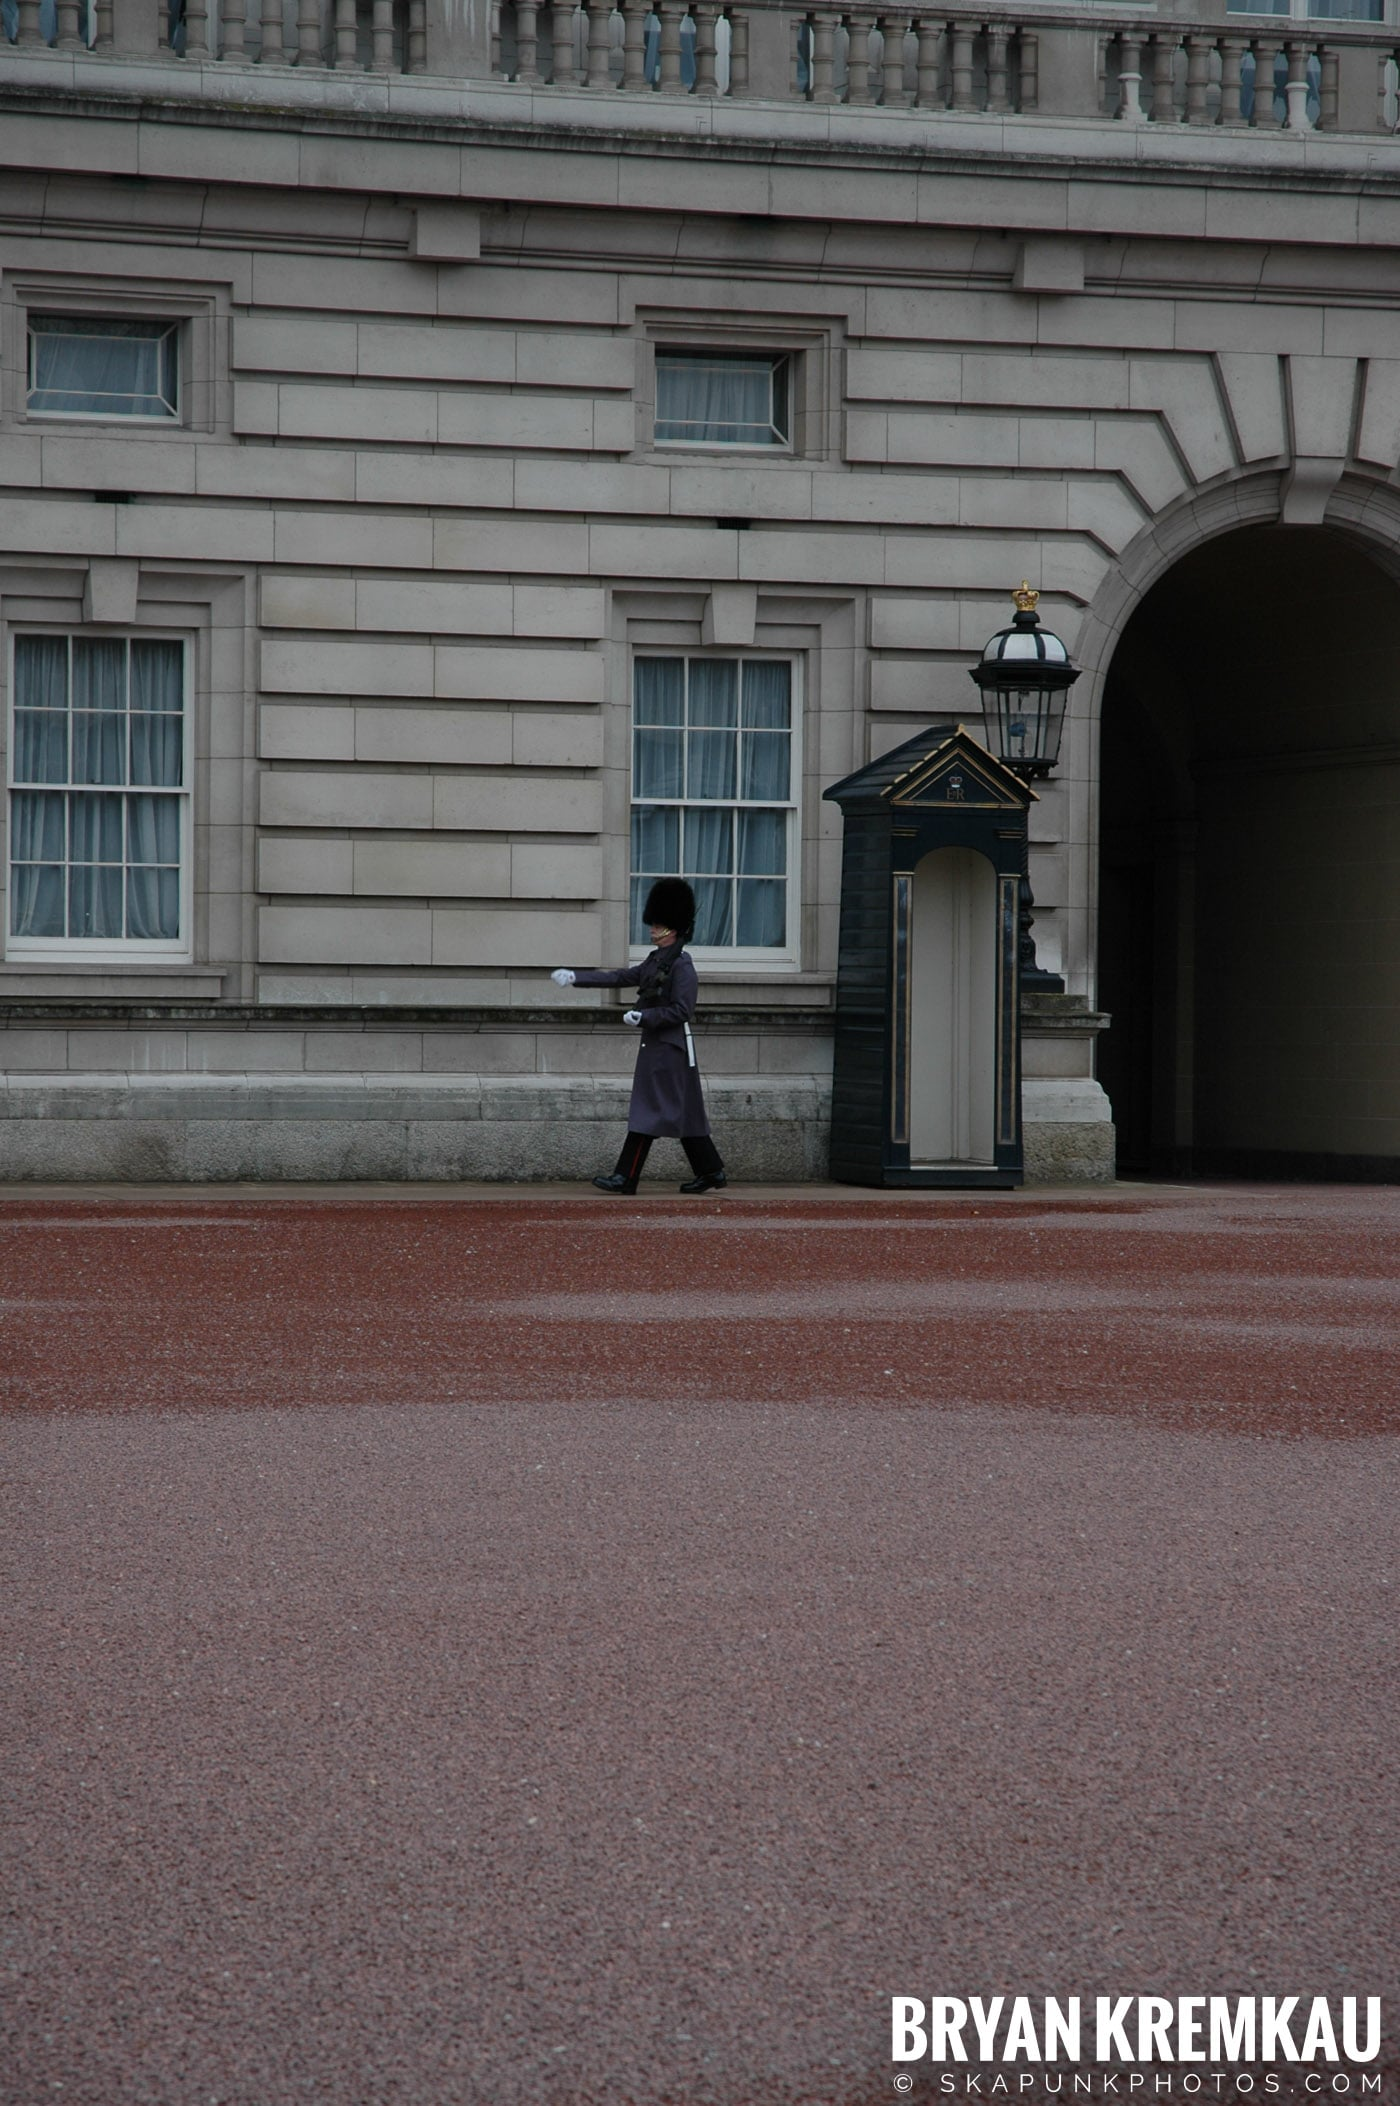 London, England - Day 5 - 12.20.05 (8)